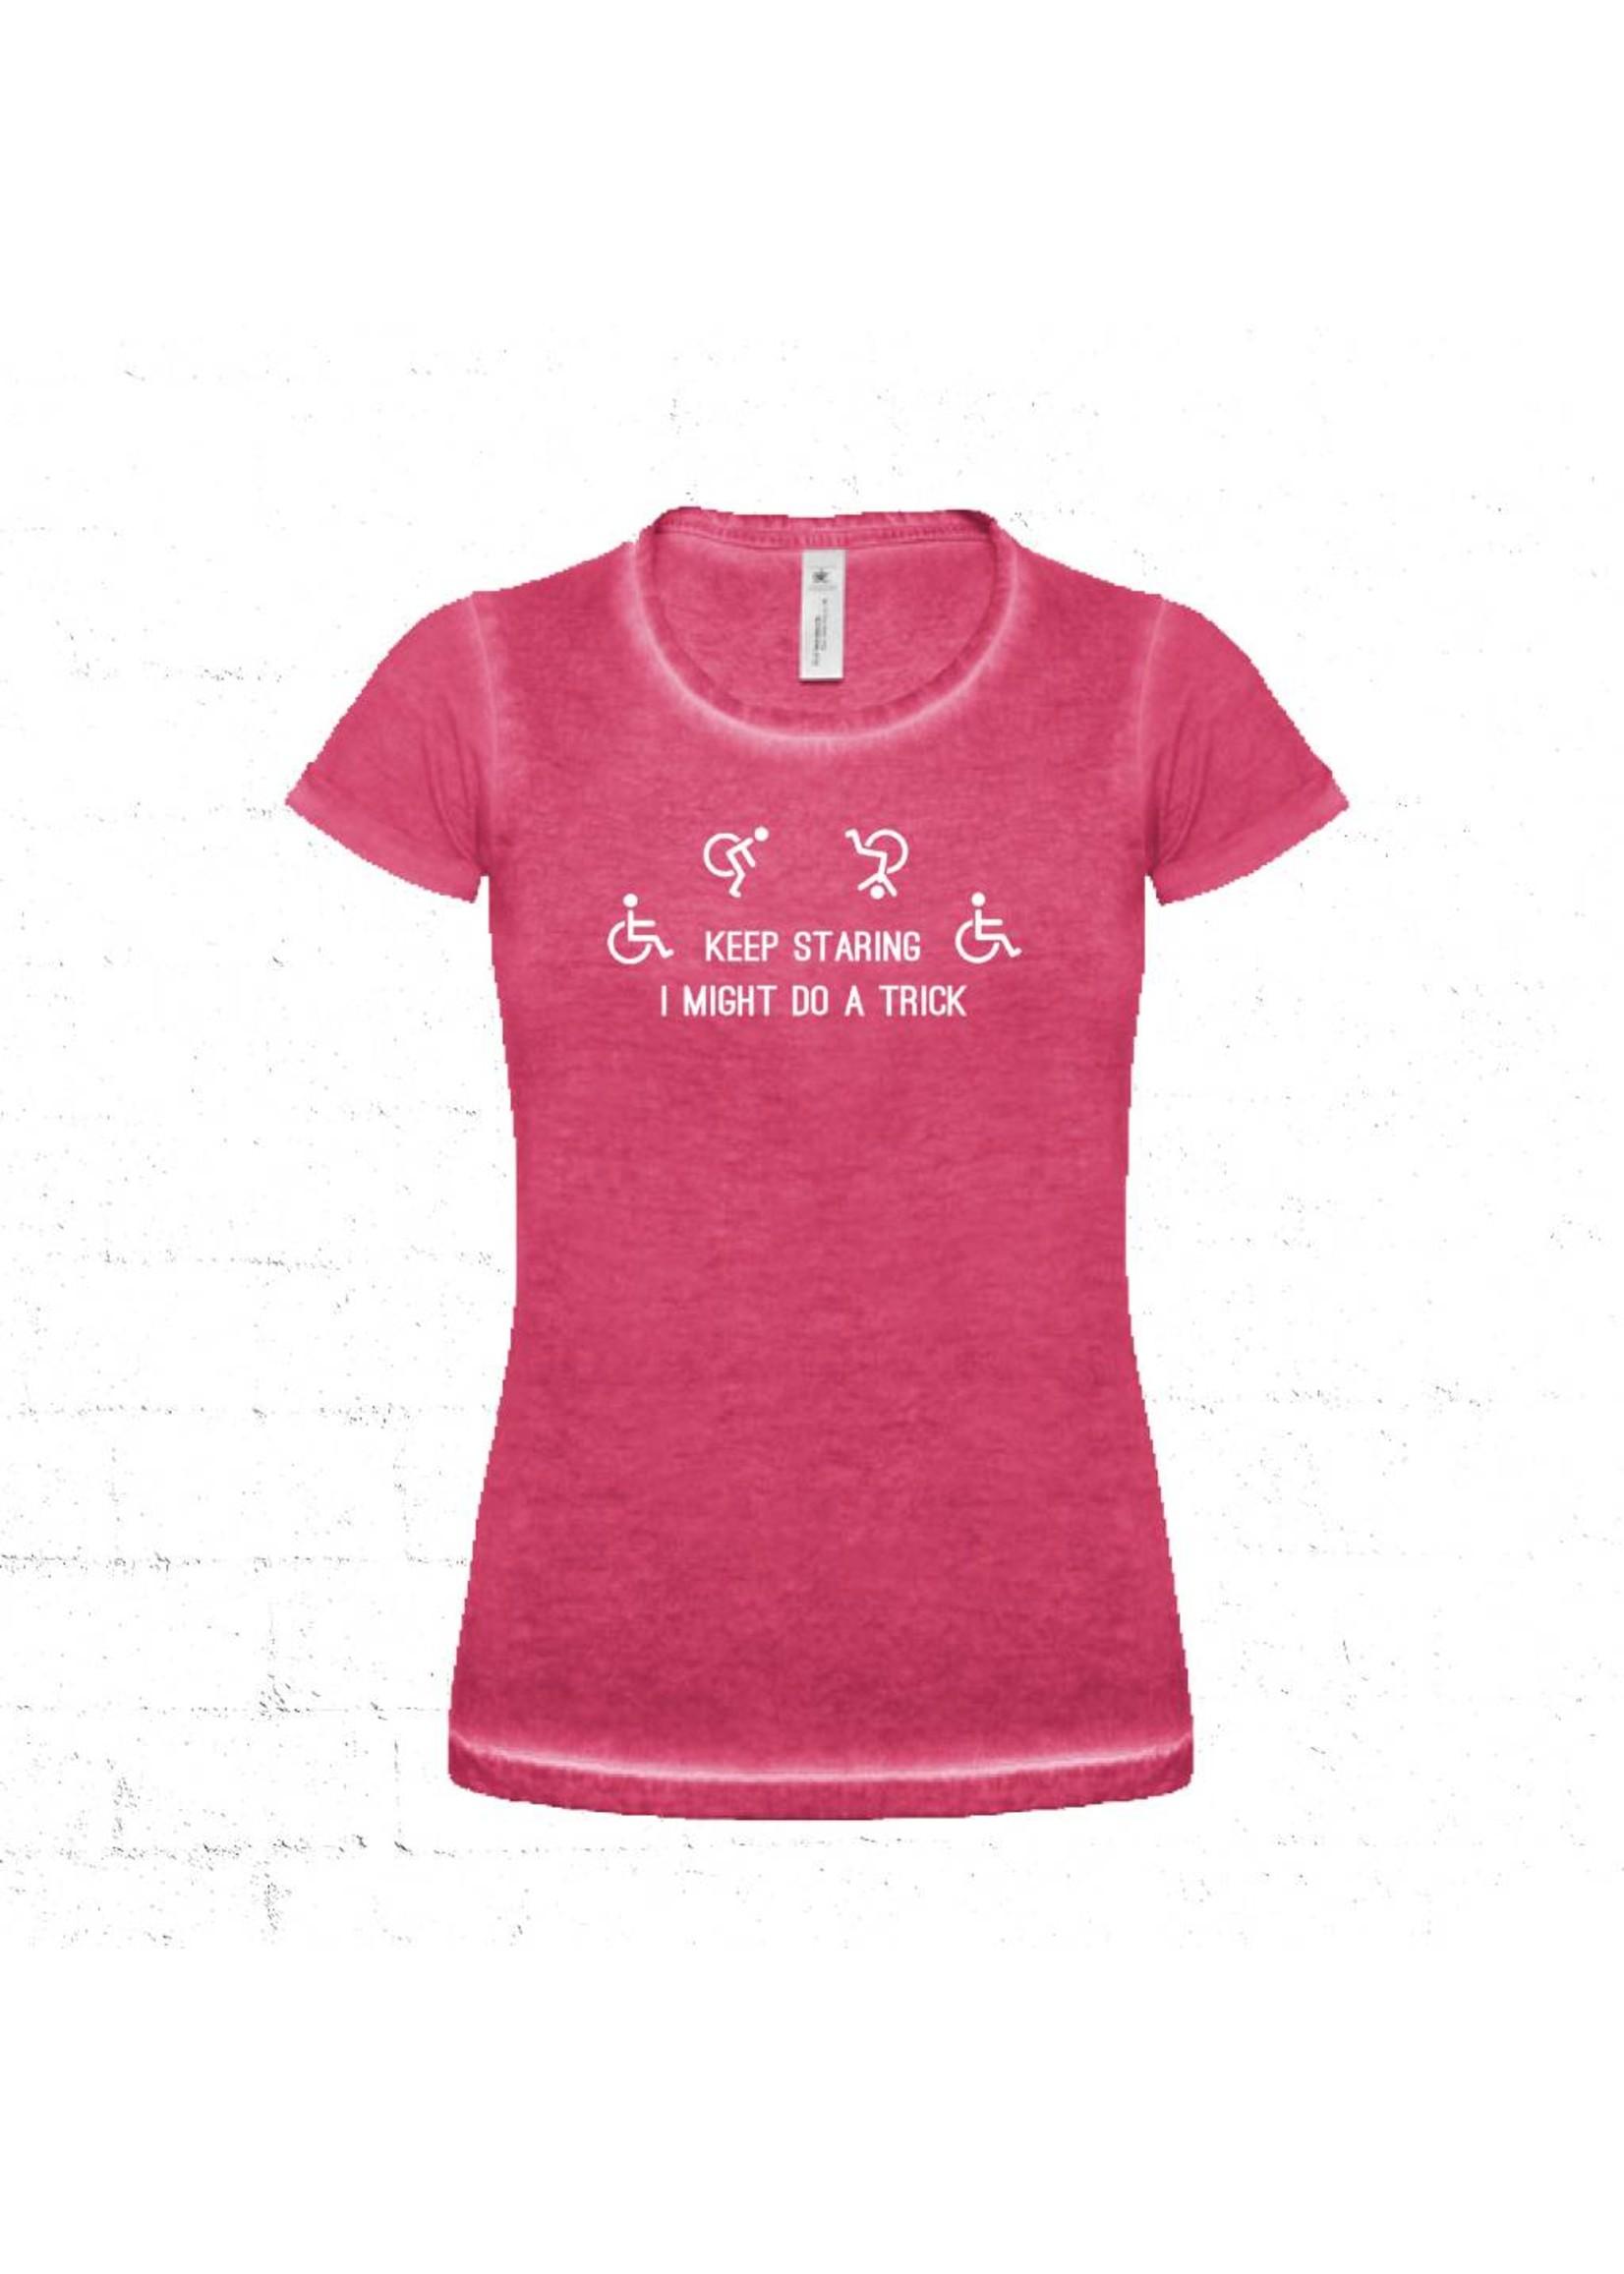 Keep staring rolstoel t-shirt - roze